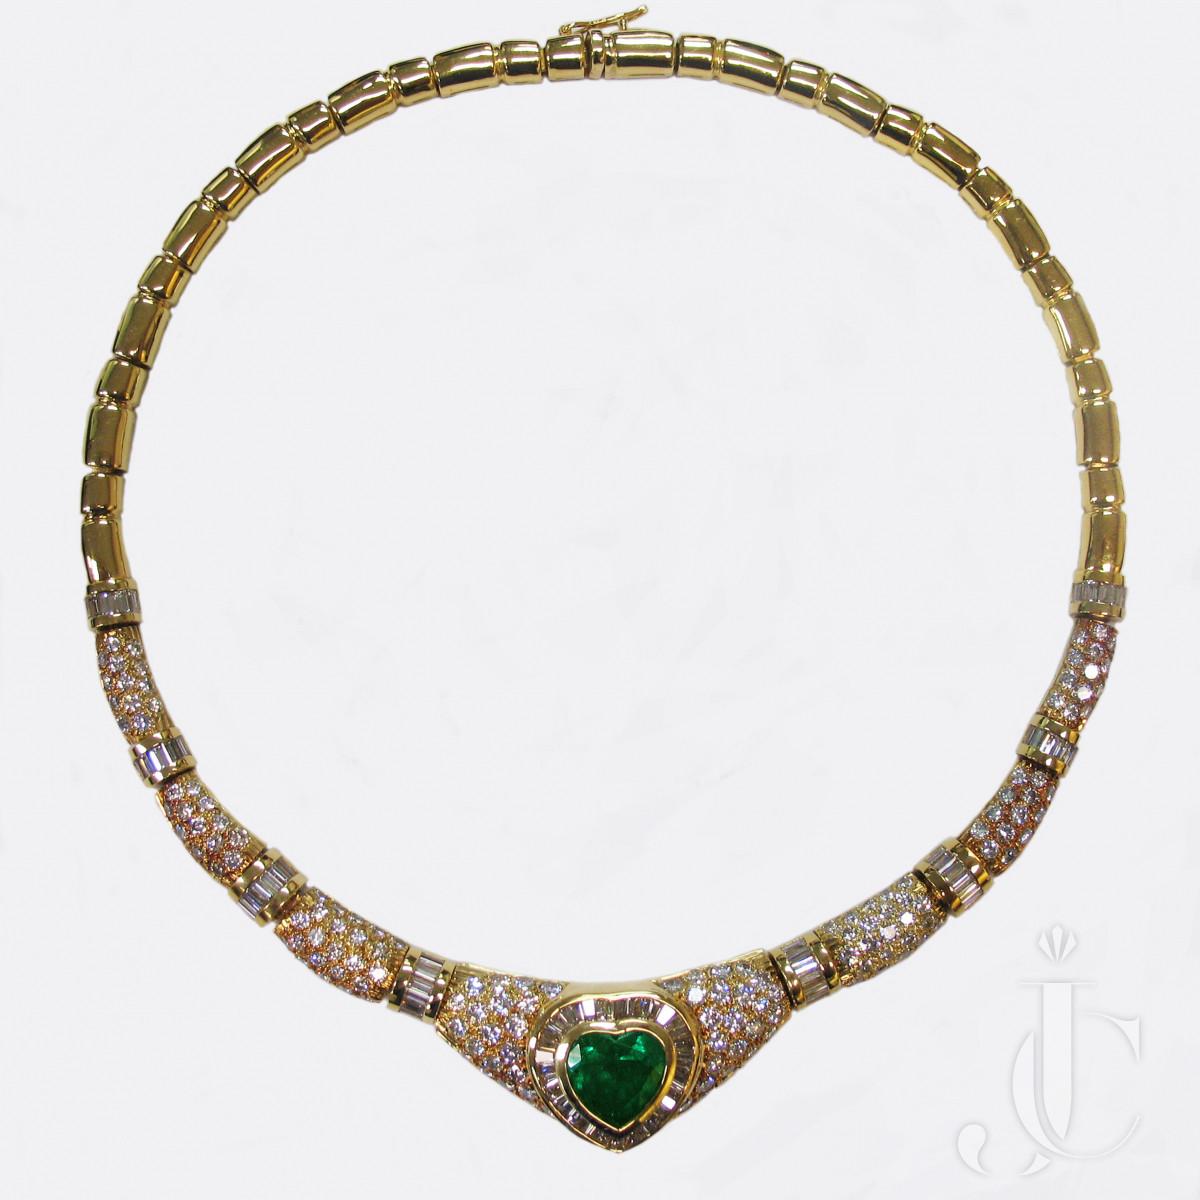 18kt Heartshape Emerald and Diamonds Necklace